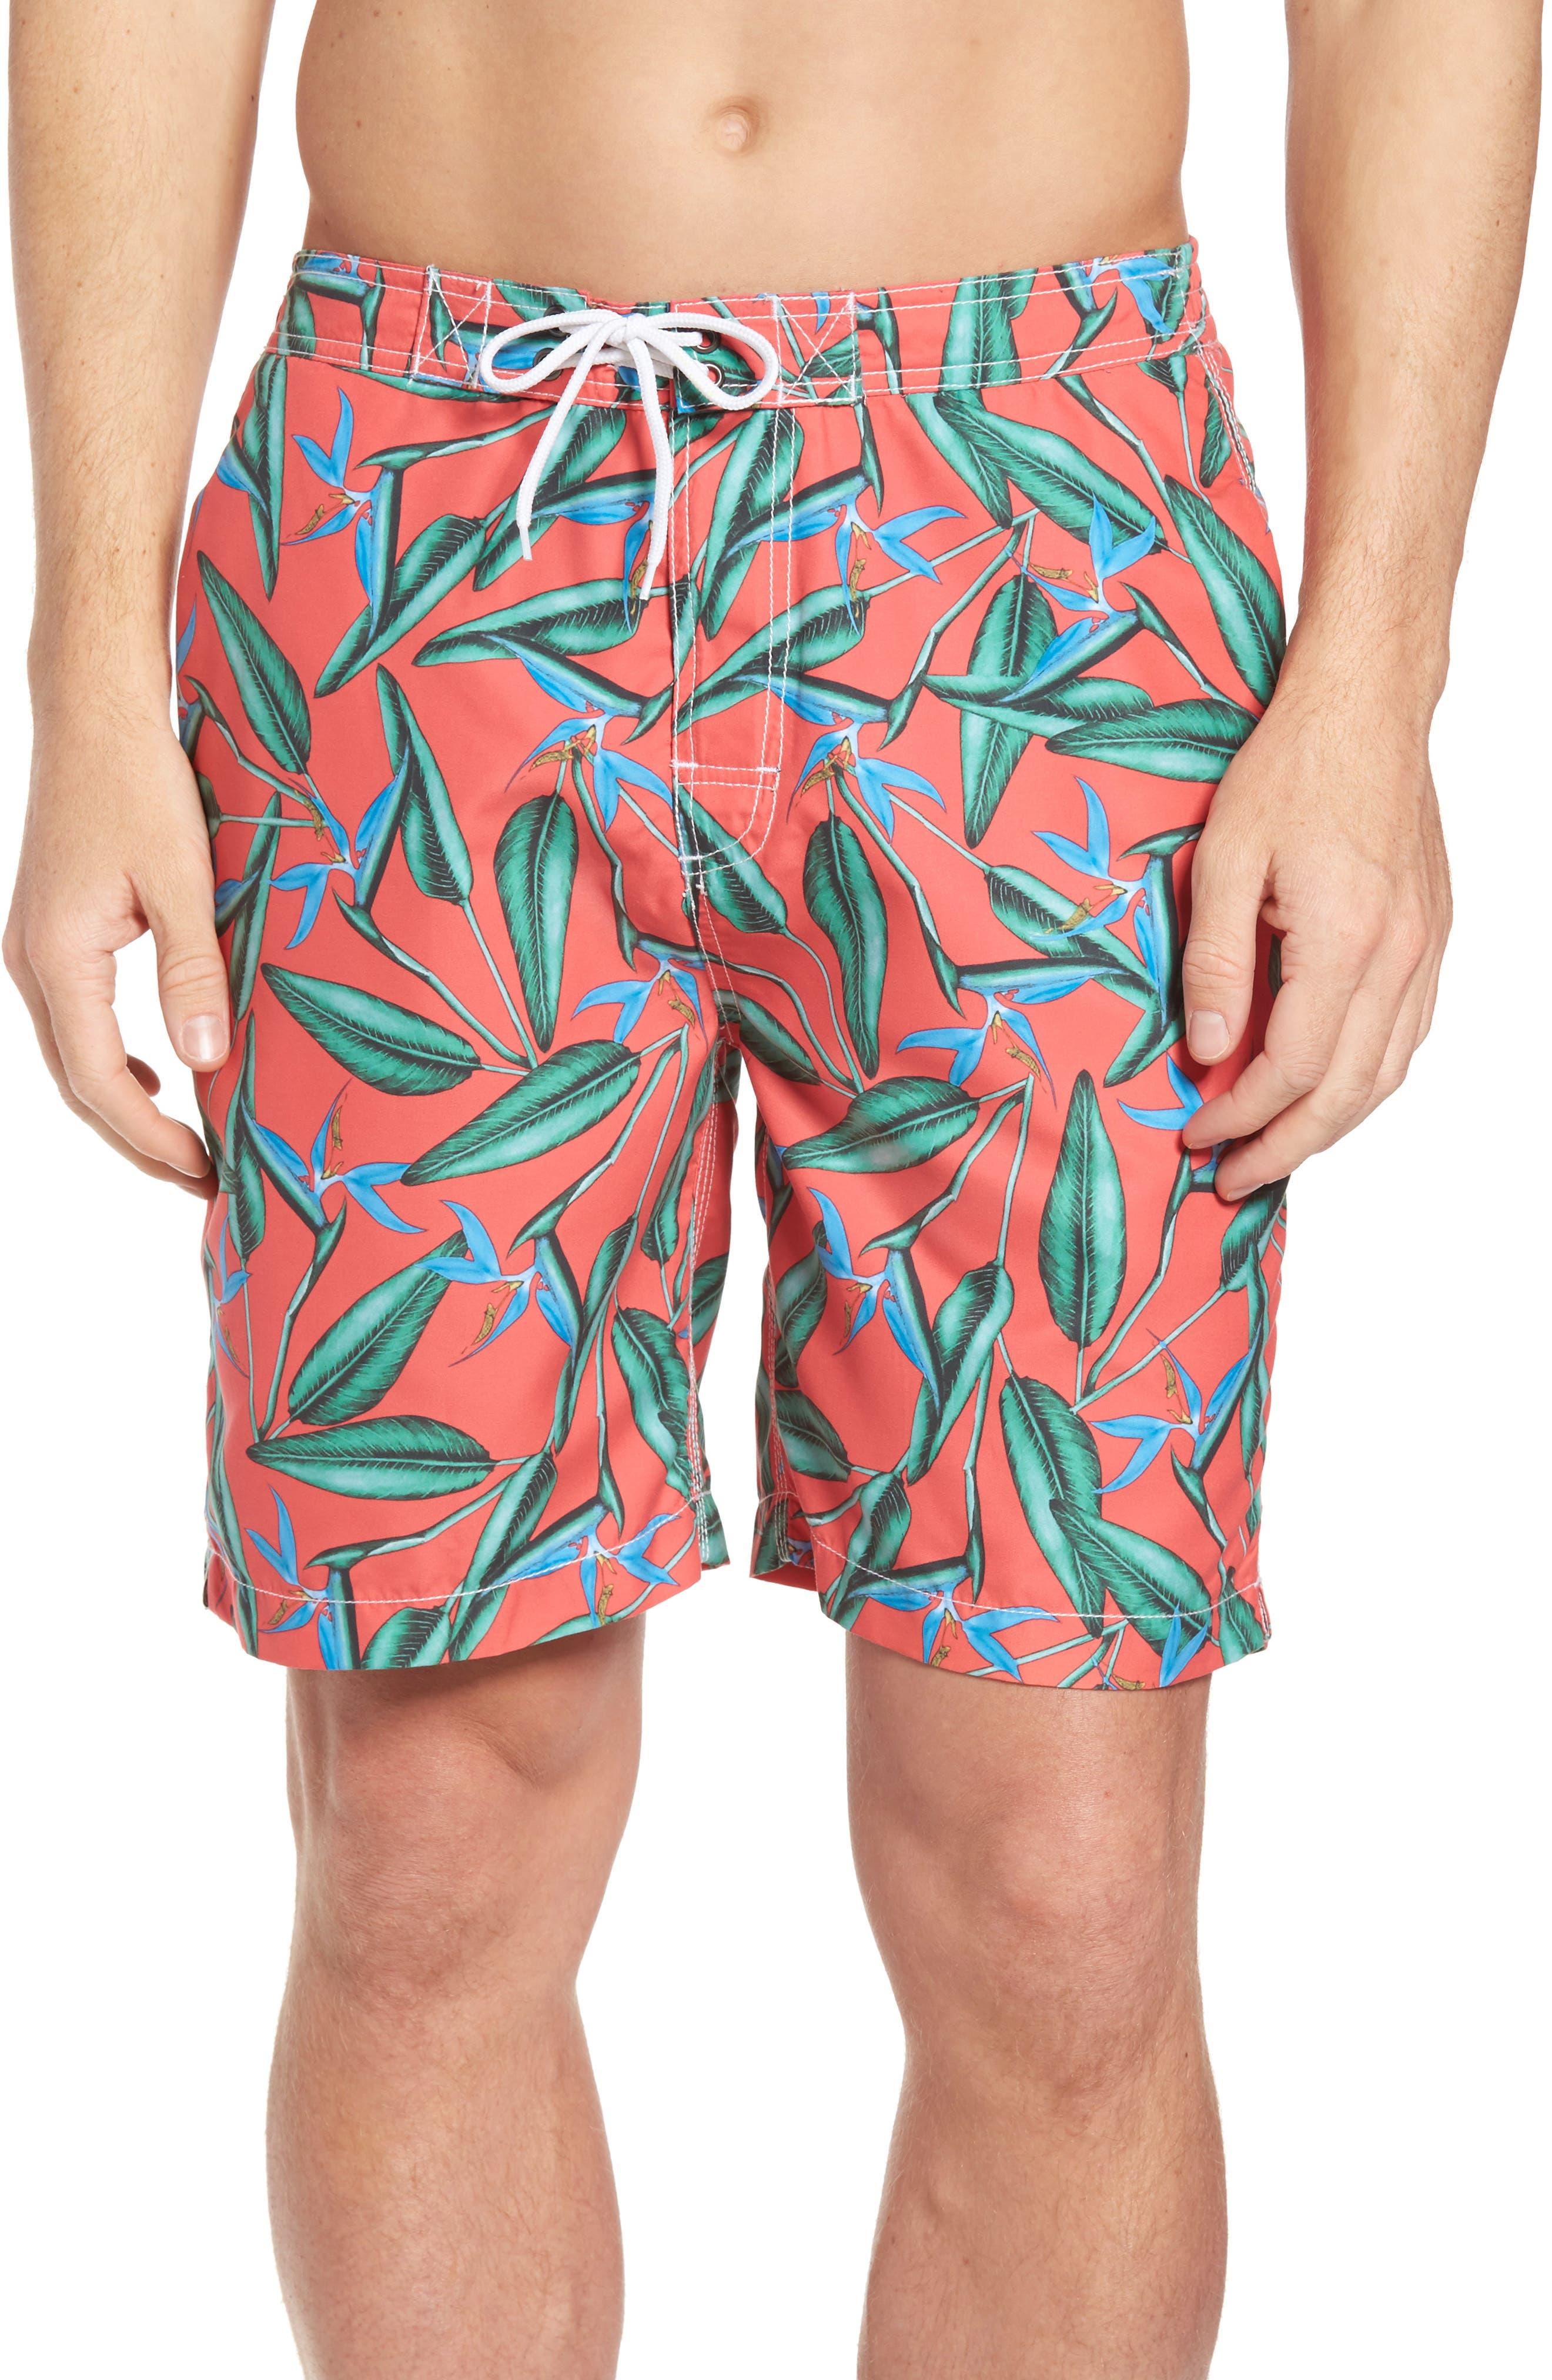 Trunks Surf & Swim Co. Swami Birds of Paradise Print Board Shorts